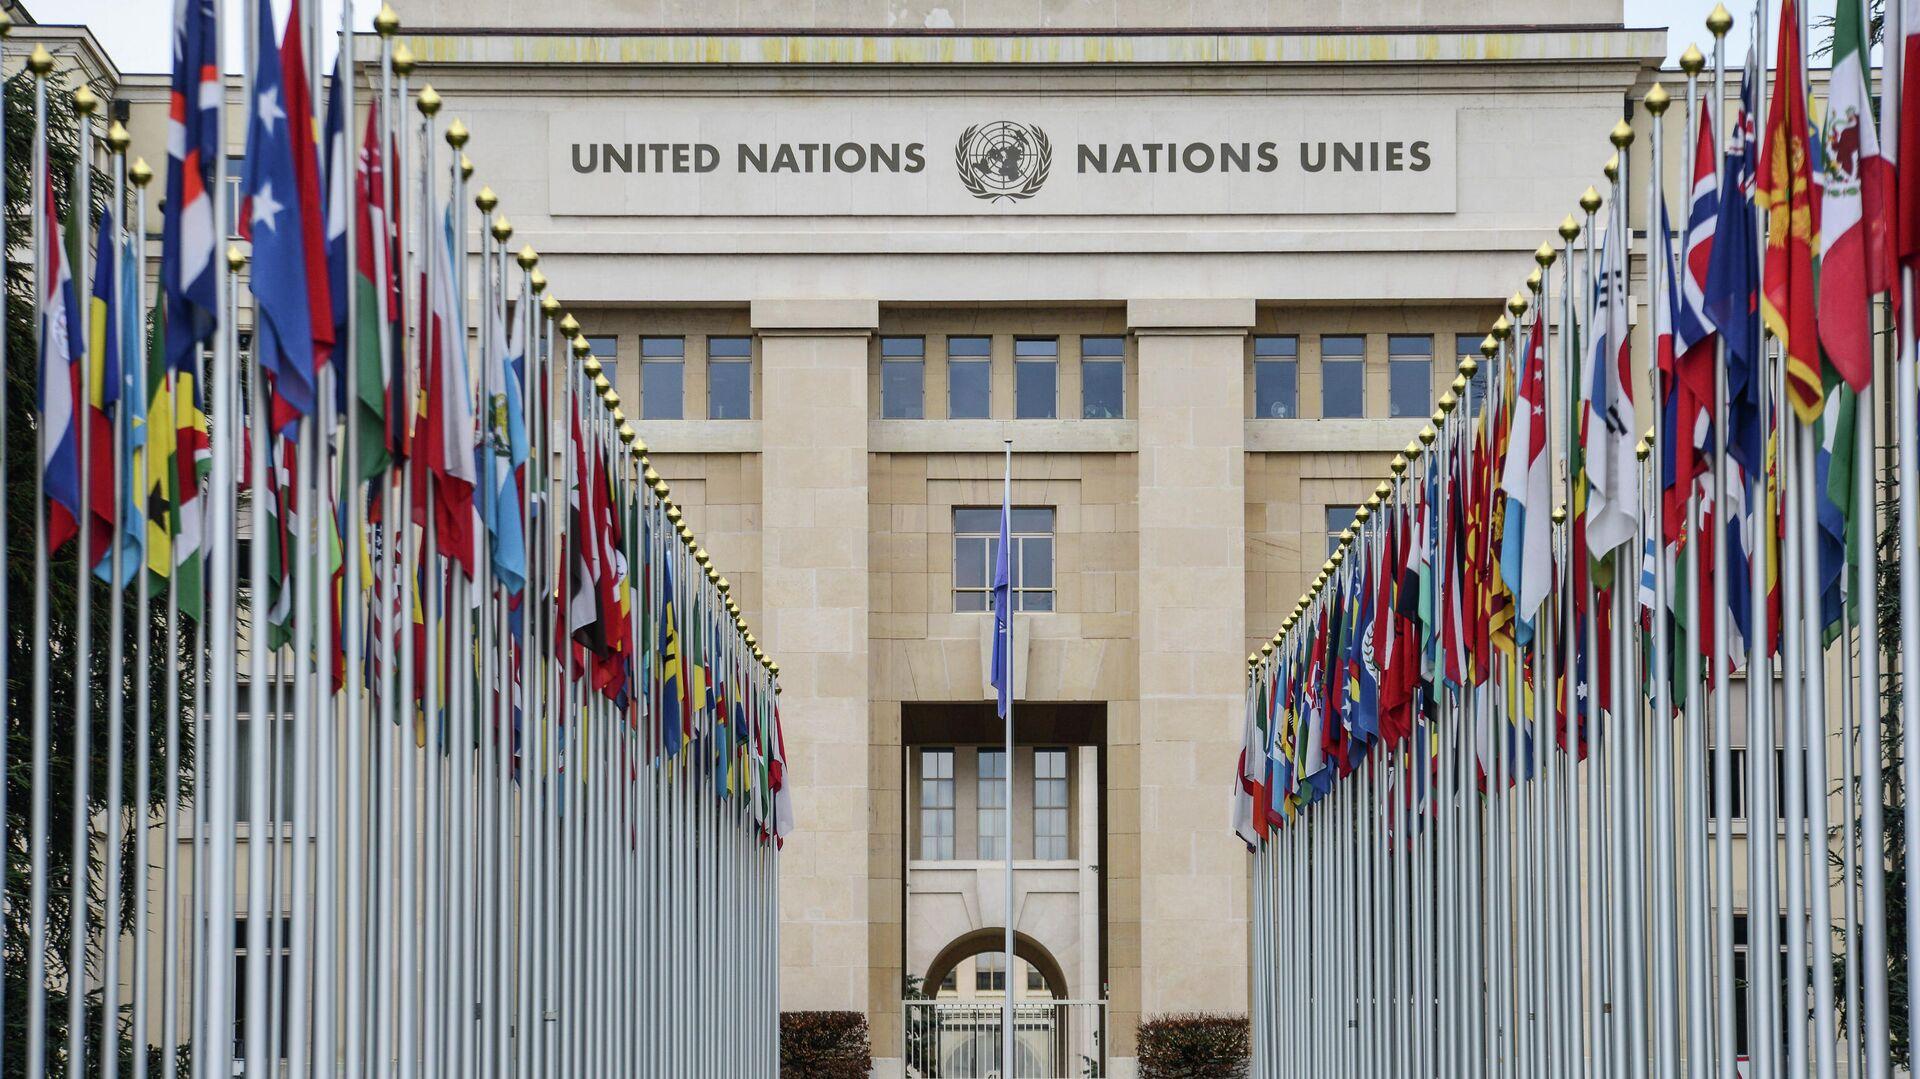 Аллея флагов возле здания ООН в Женеве - РИА Новости, 1920, 05.12.2020